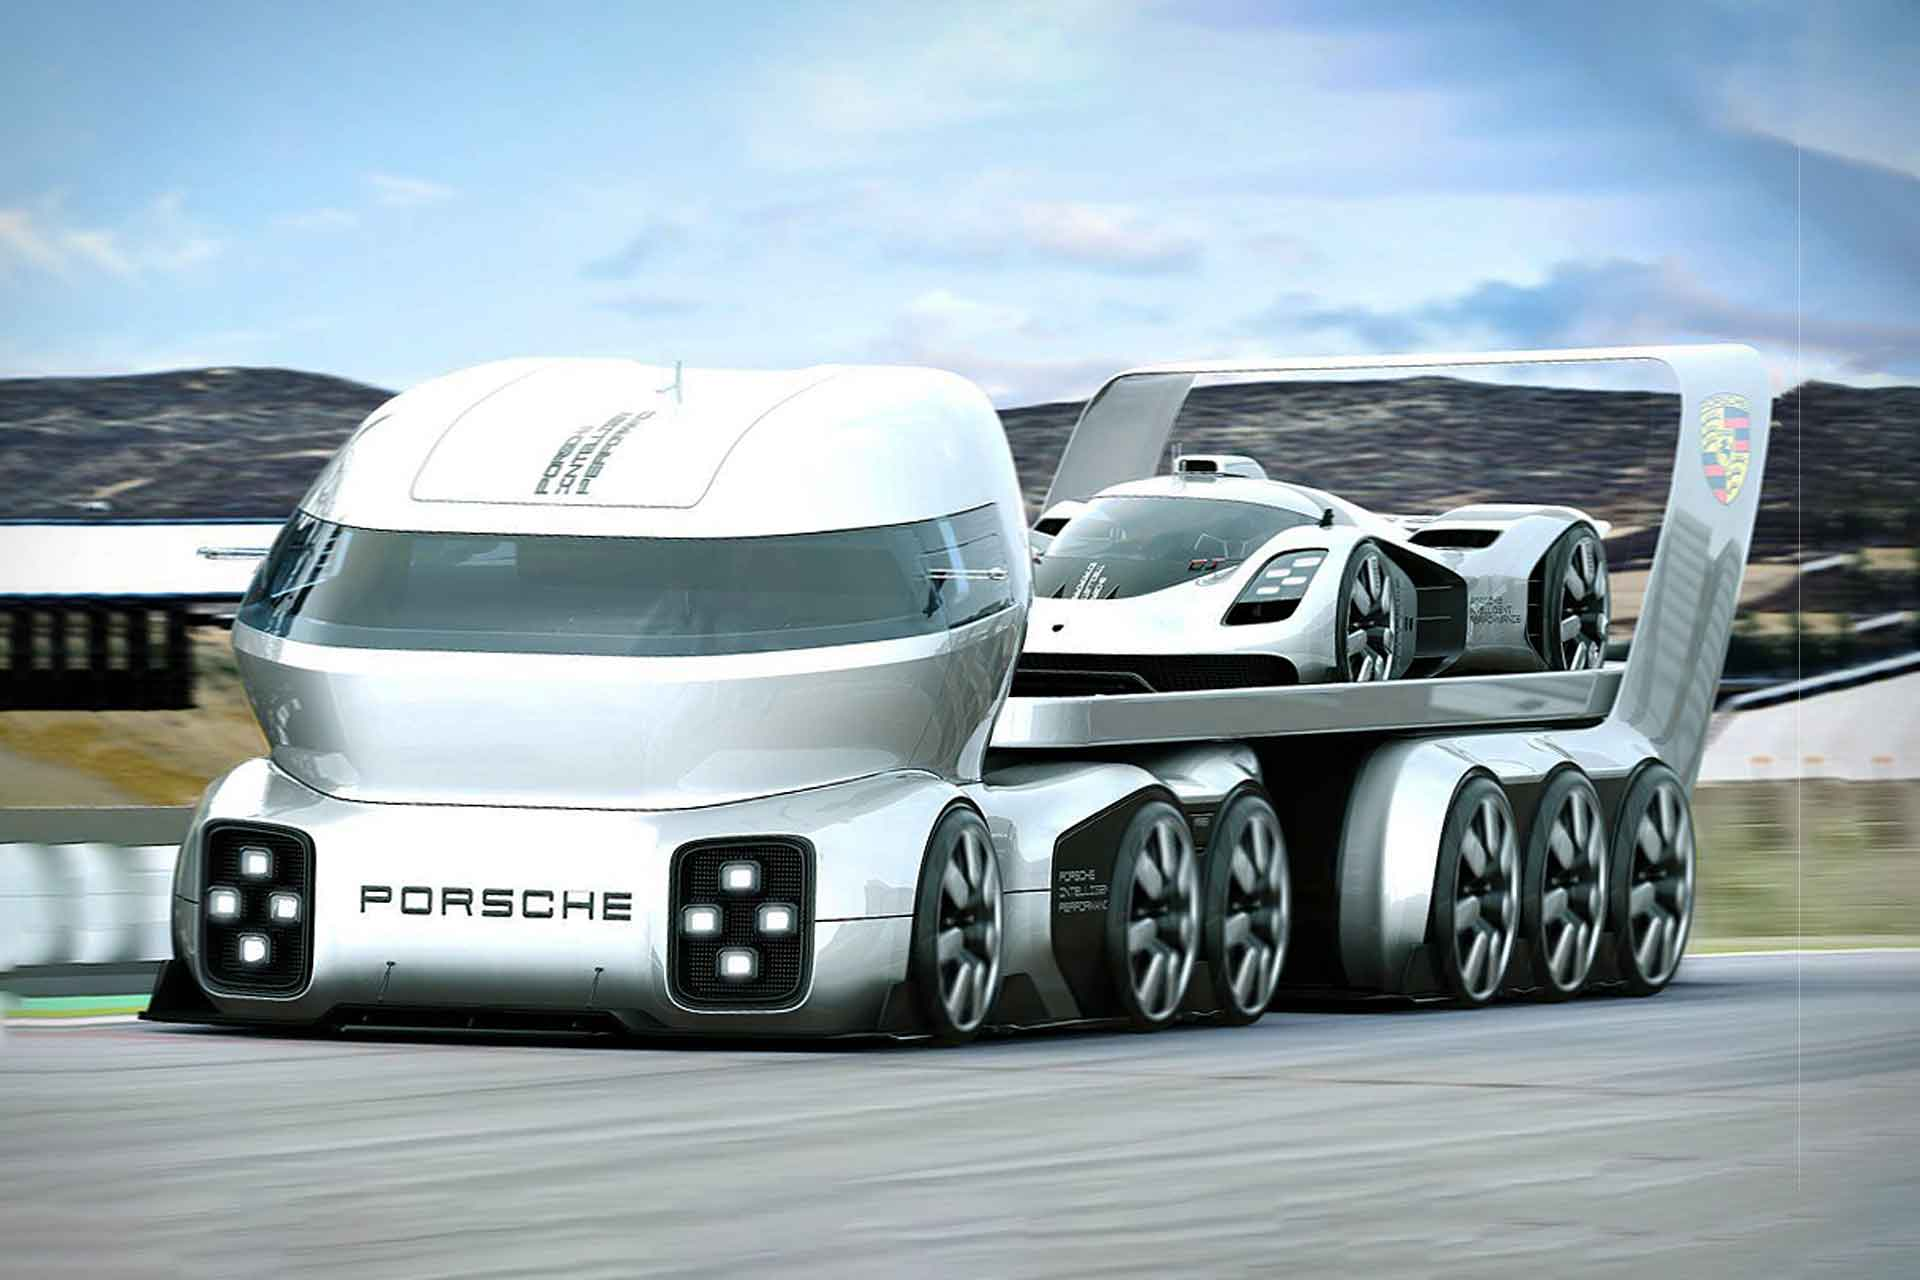 Pictures Of Future Trucks: Porsche GT Vision Truck Concept